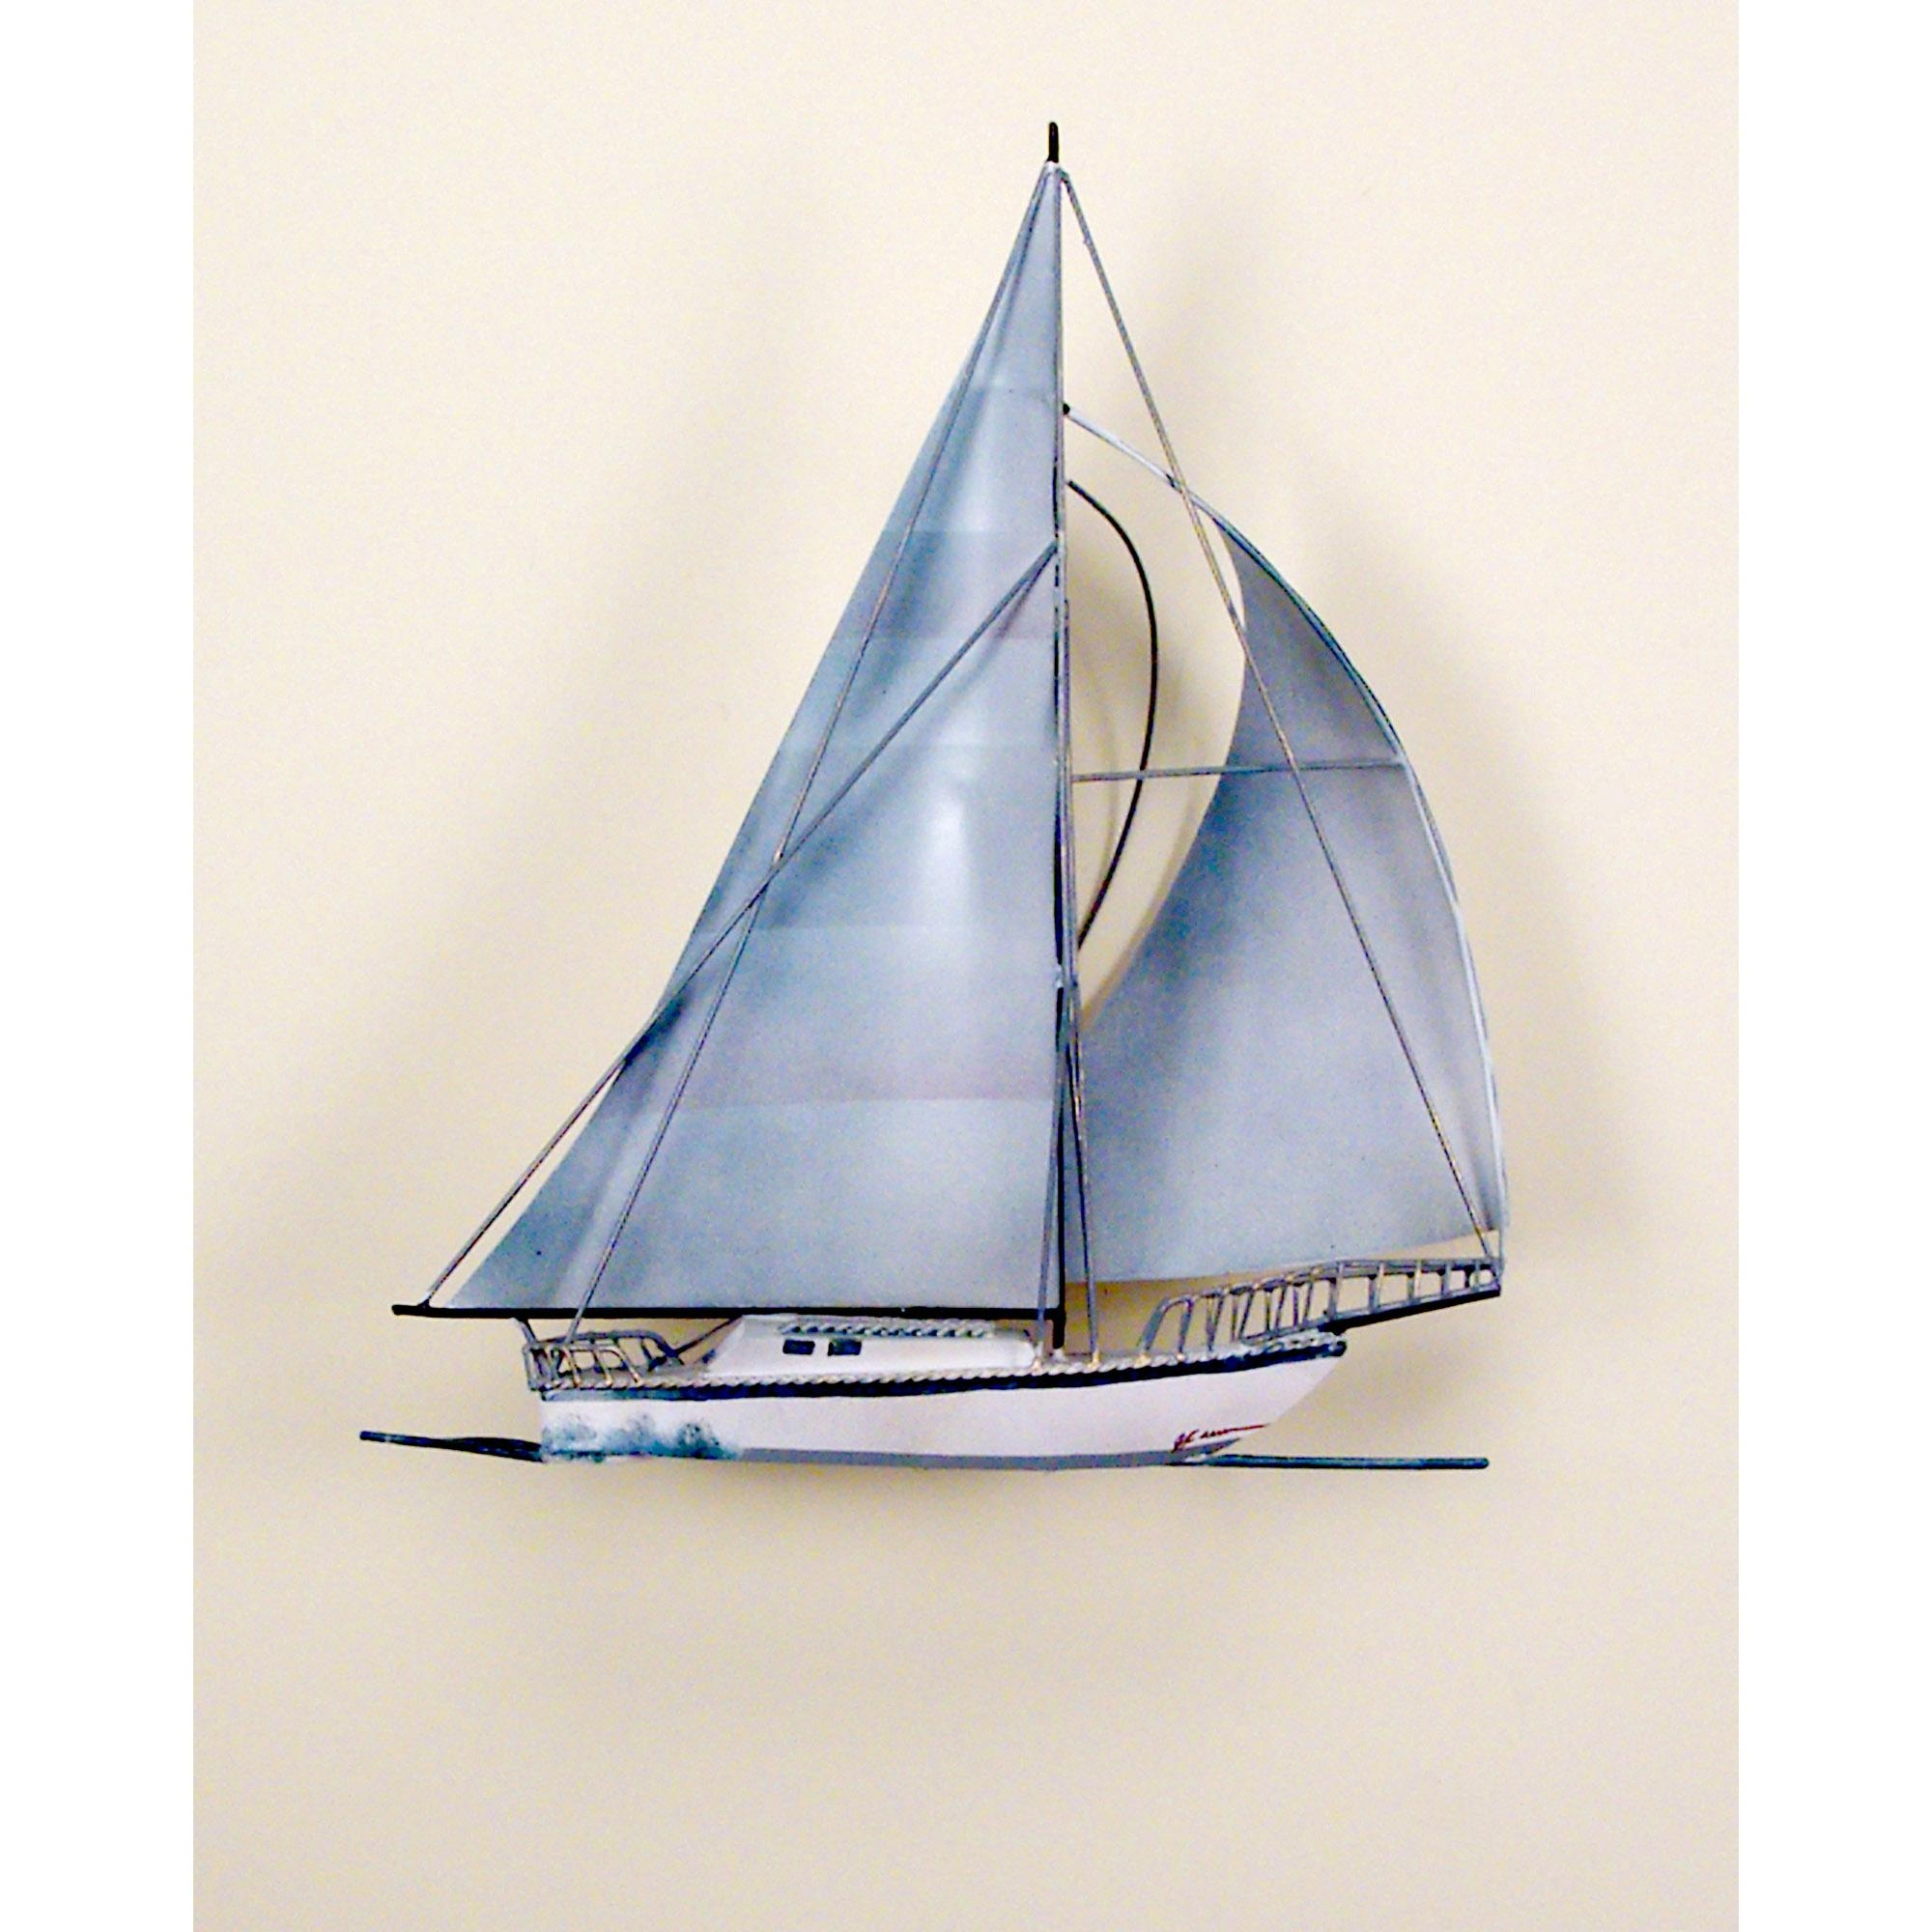 Windjamer Sailboat, Single, Ocean, Boat, Nautical, Sailing Pertaining To Metal Sailboat Wall Art (View 4 of 20)